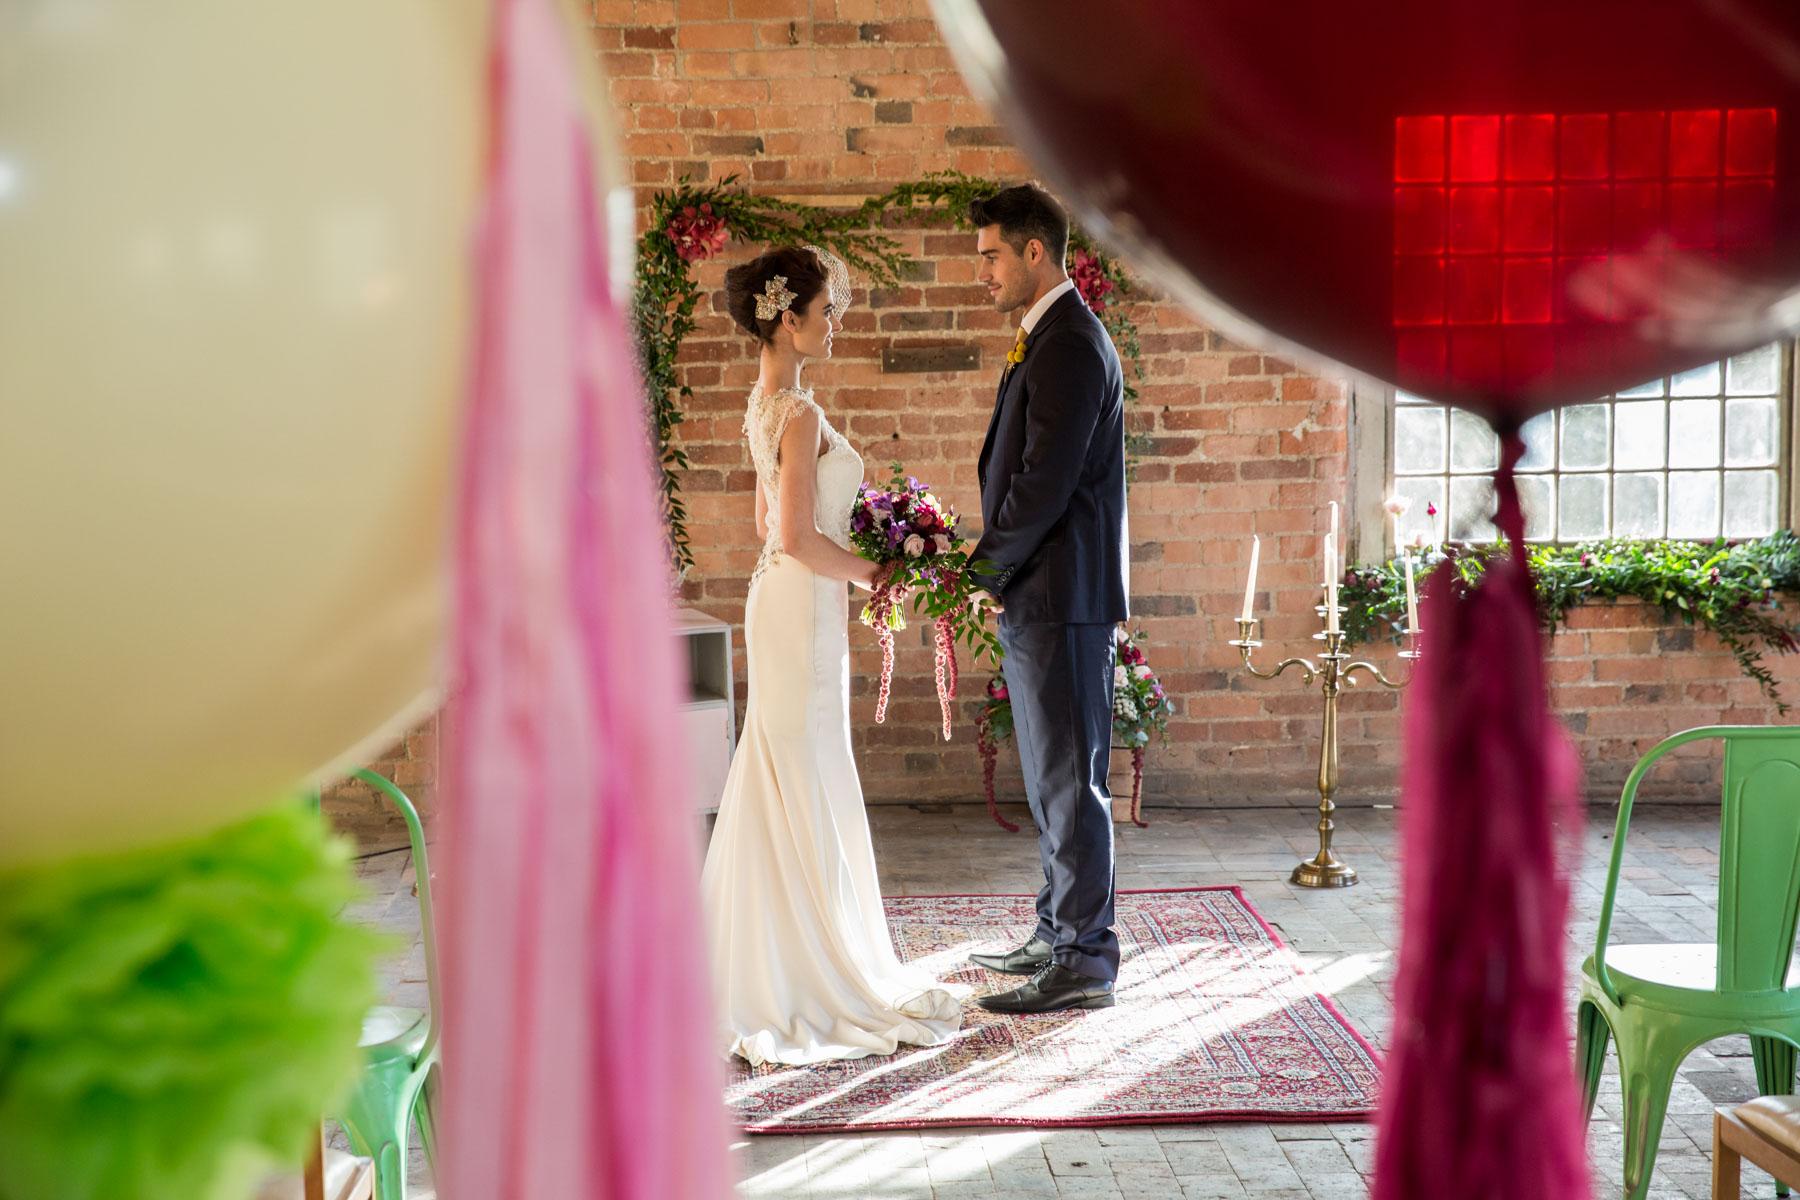 The West Mill at Darley Abbey Mills Styled Wedding Shoot by Richard Murgatroyd